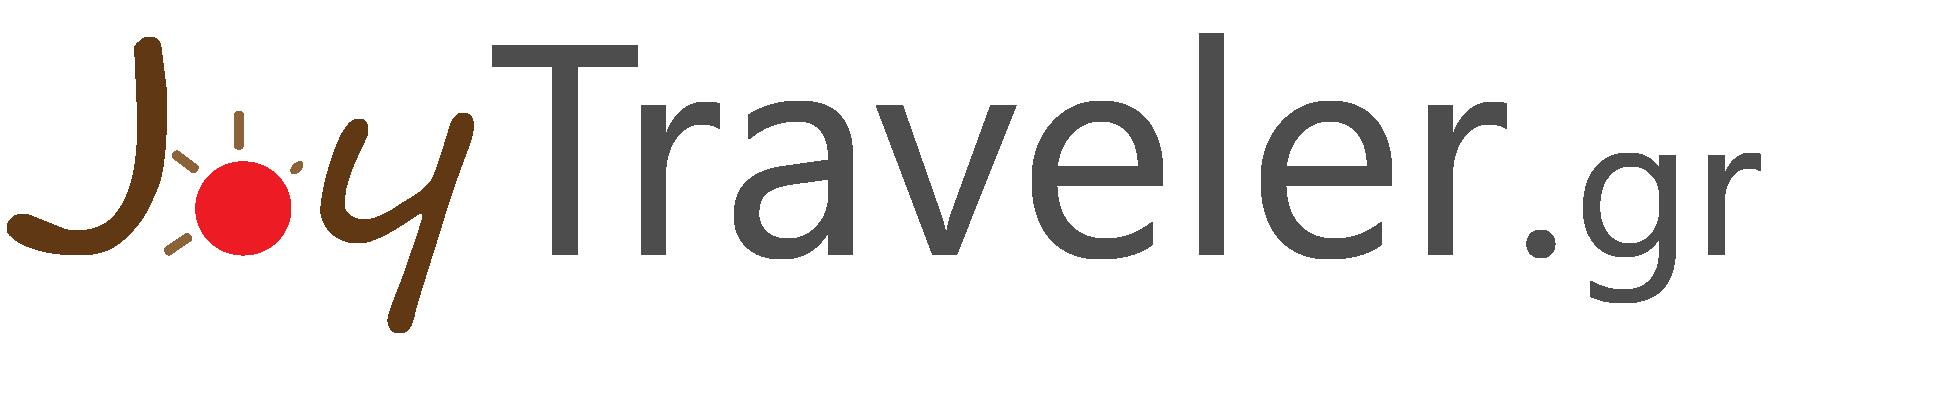 joytraveler.gr logo